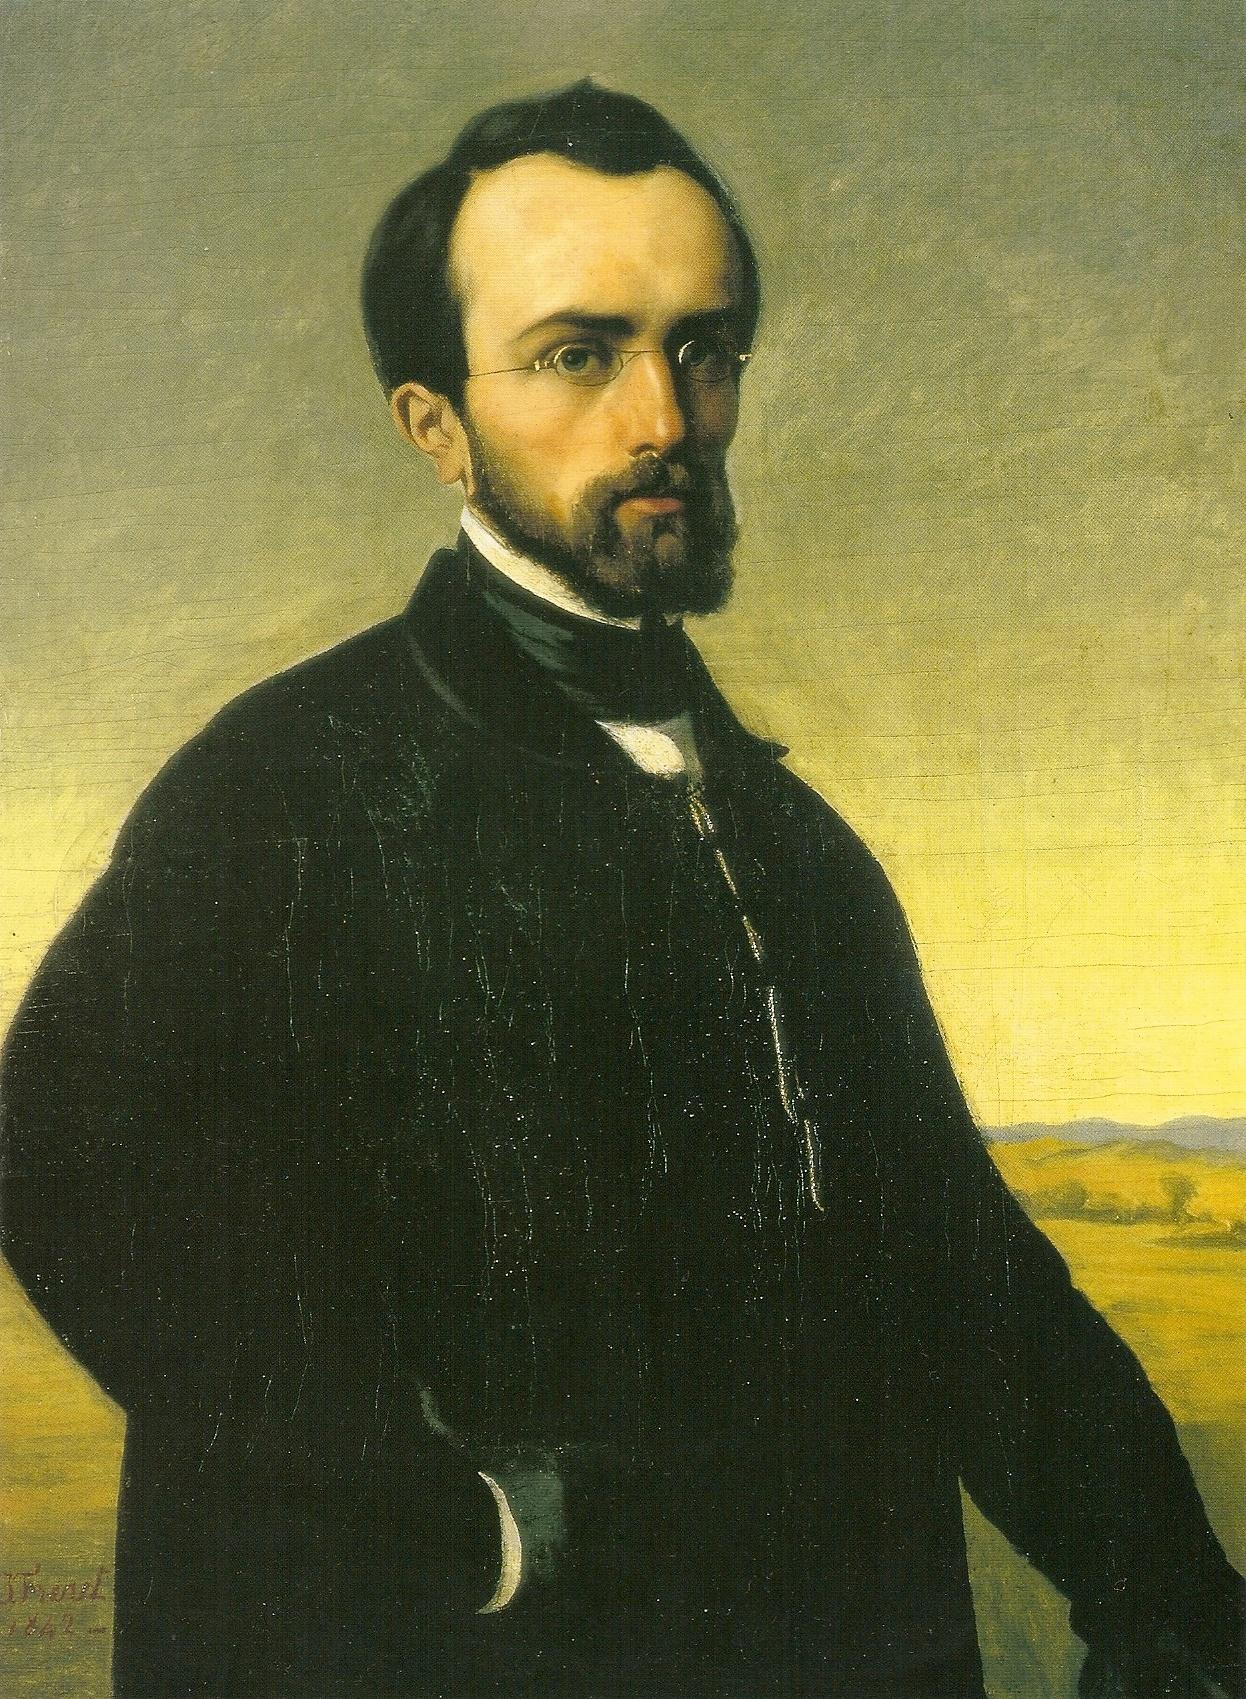 Image of Jean-Baptiste Frenet from Wikidata